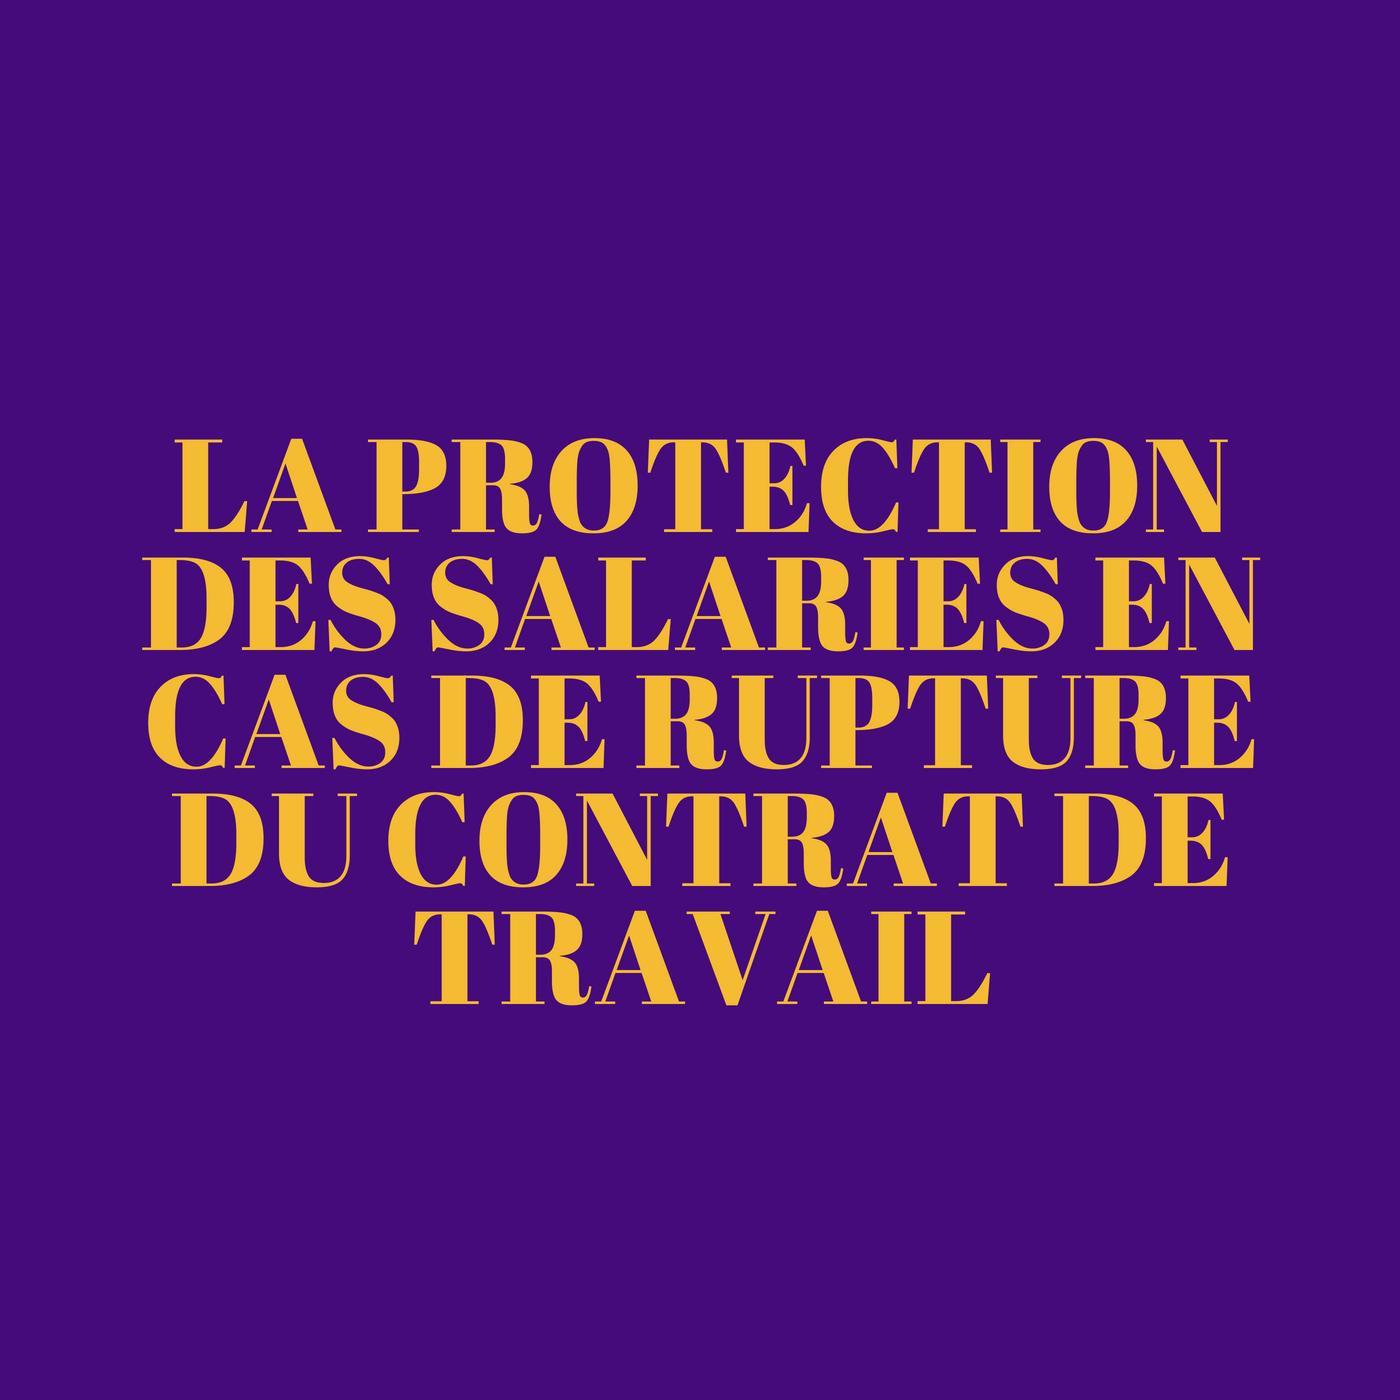 b2ebb2f6528 La protection des salariés en cas de rupture du contrat de travail